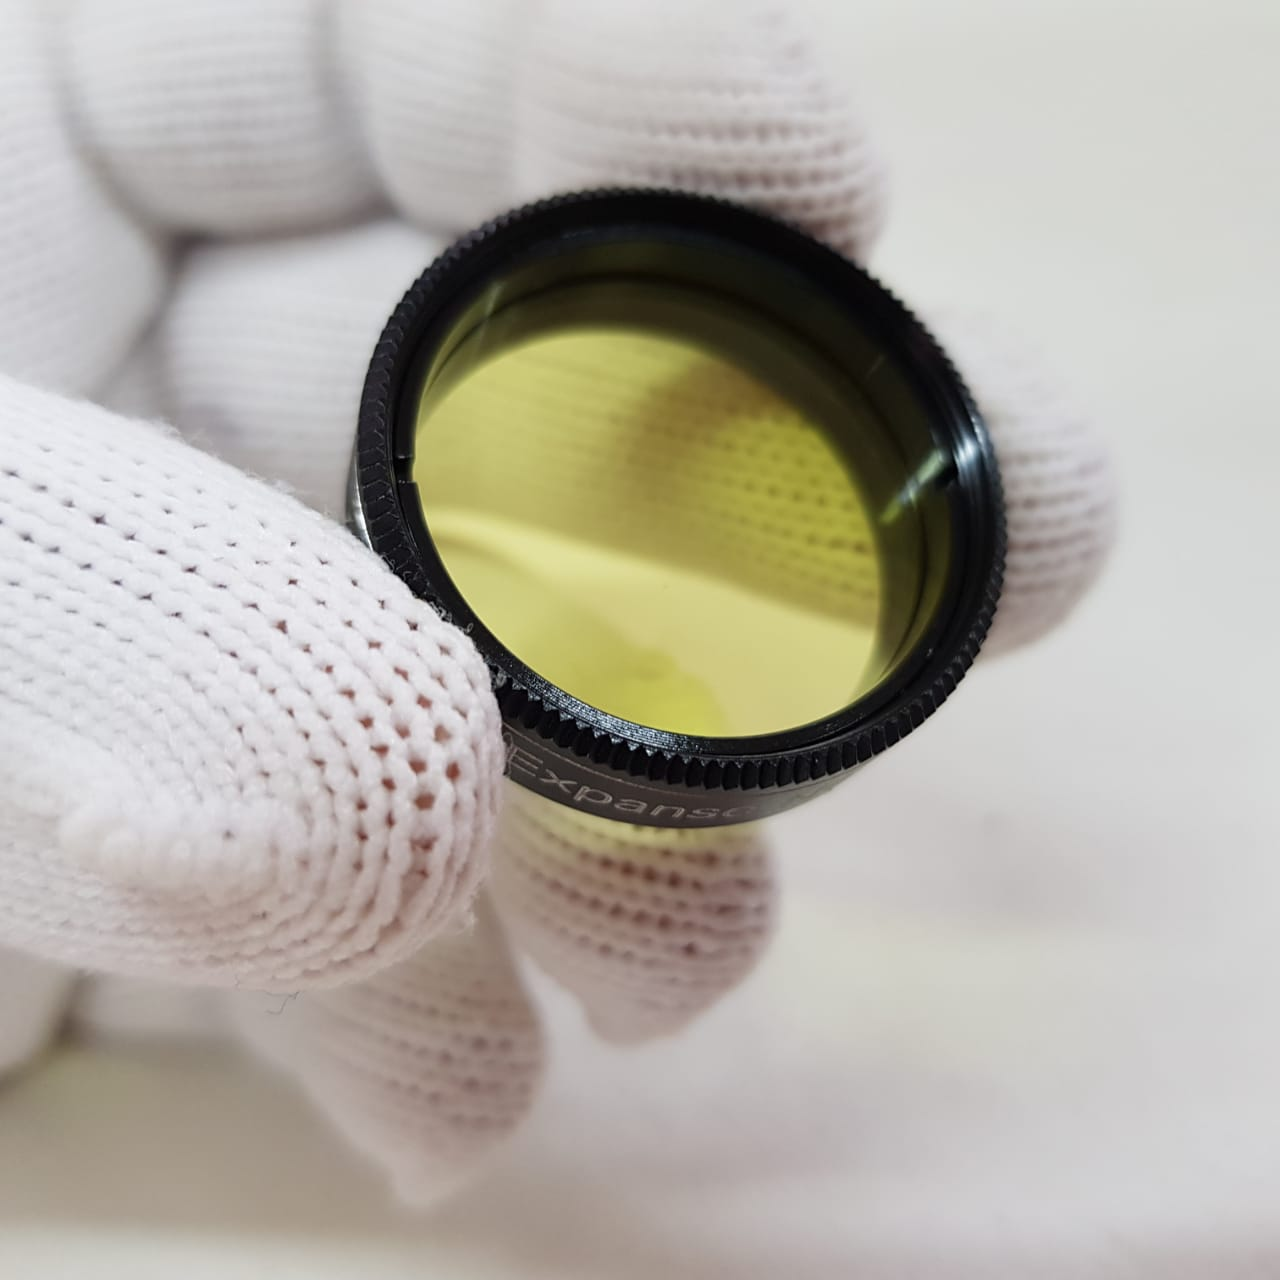 "Filtro 1,25"" - Color Planetary - Yellon Citrus 83% - EXPANSE"